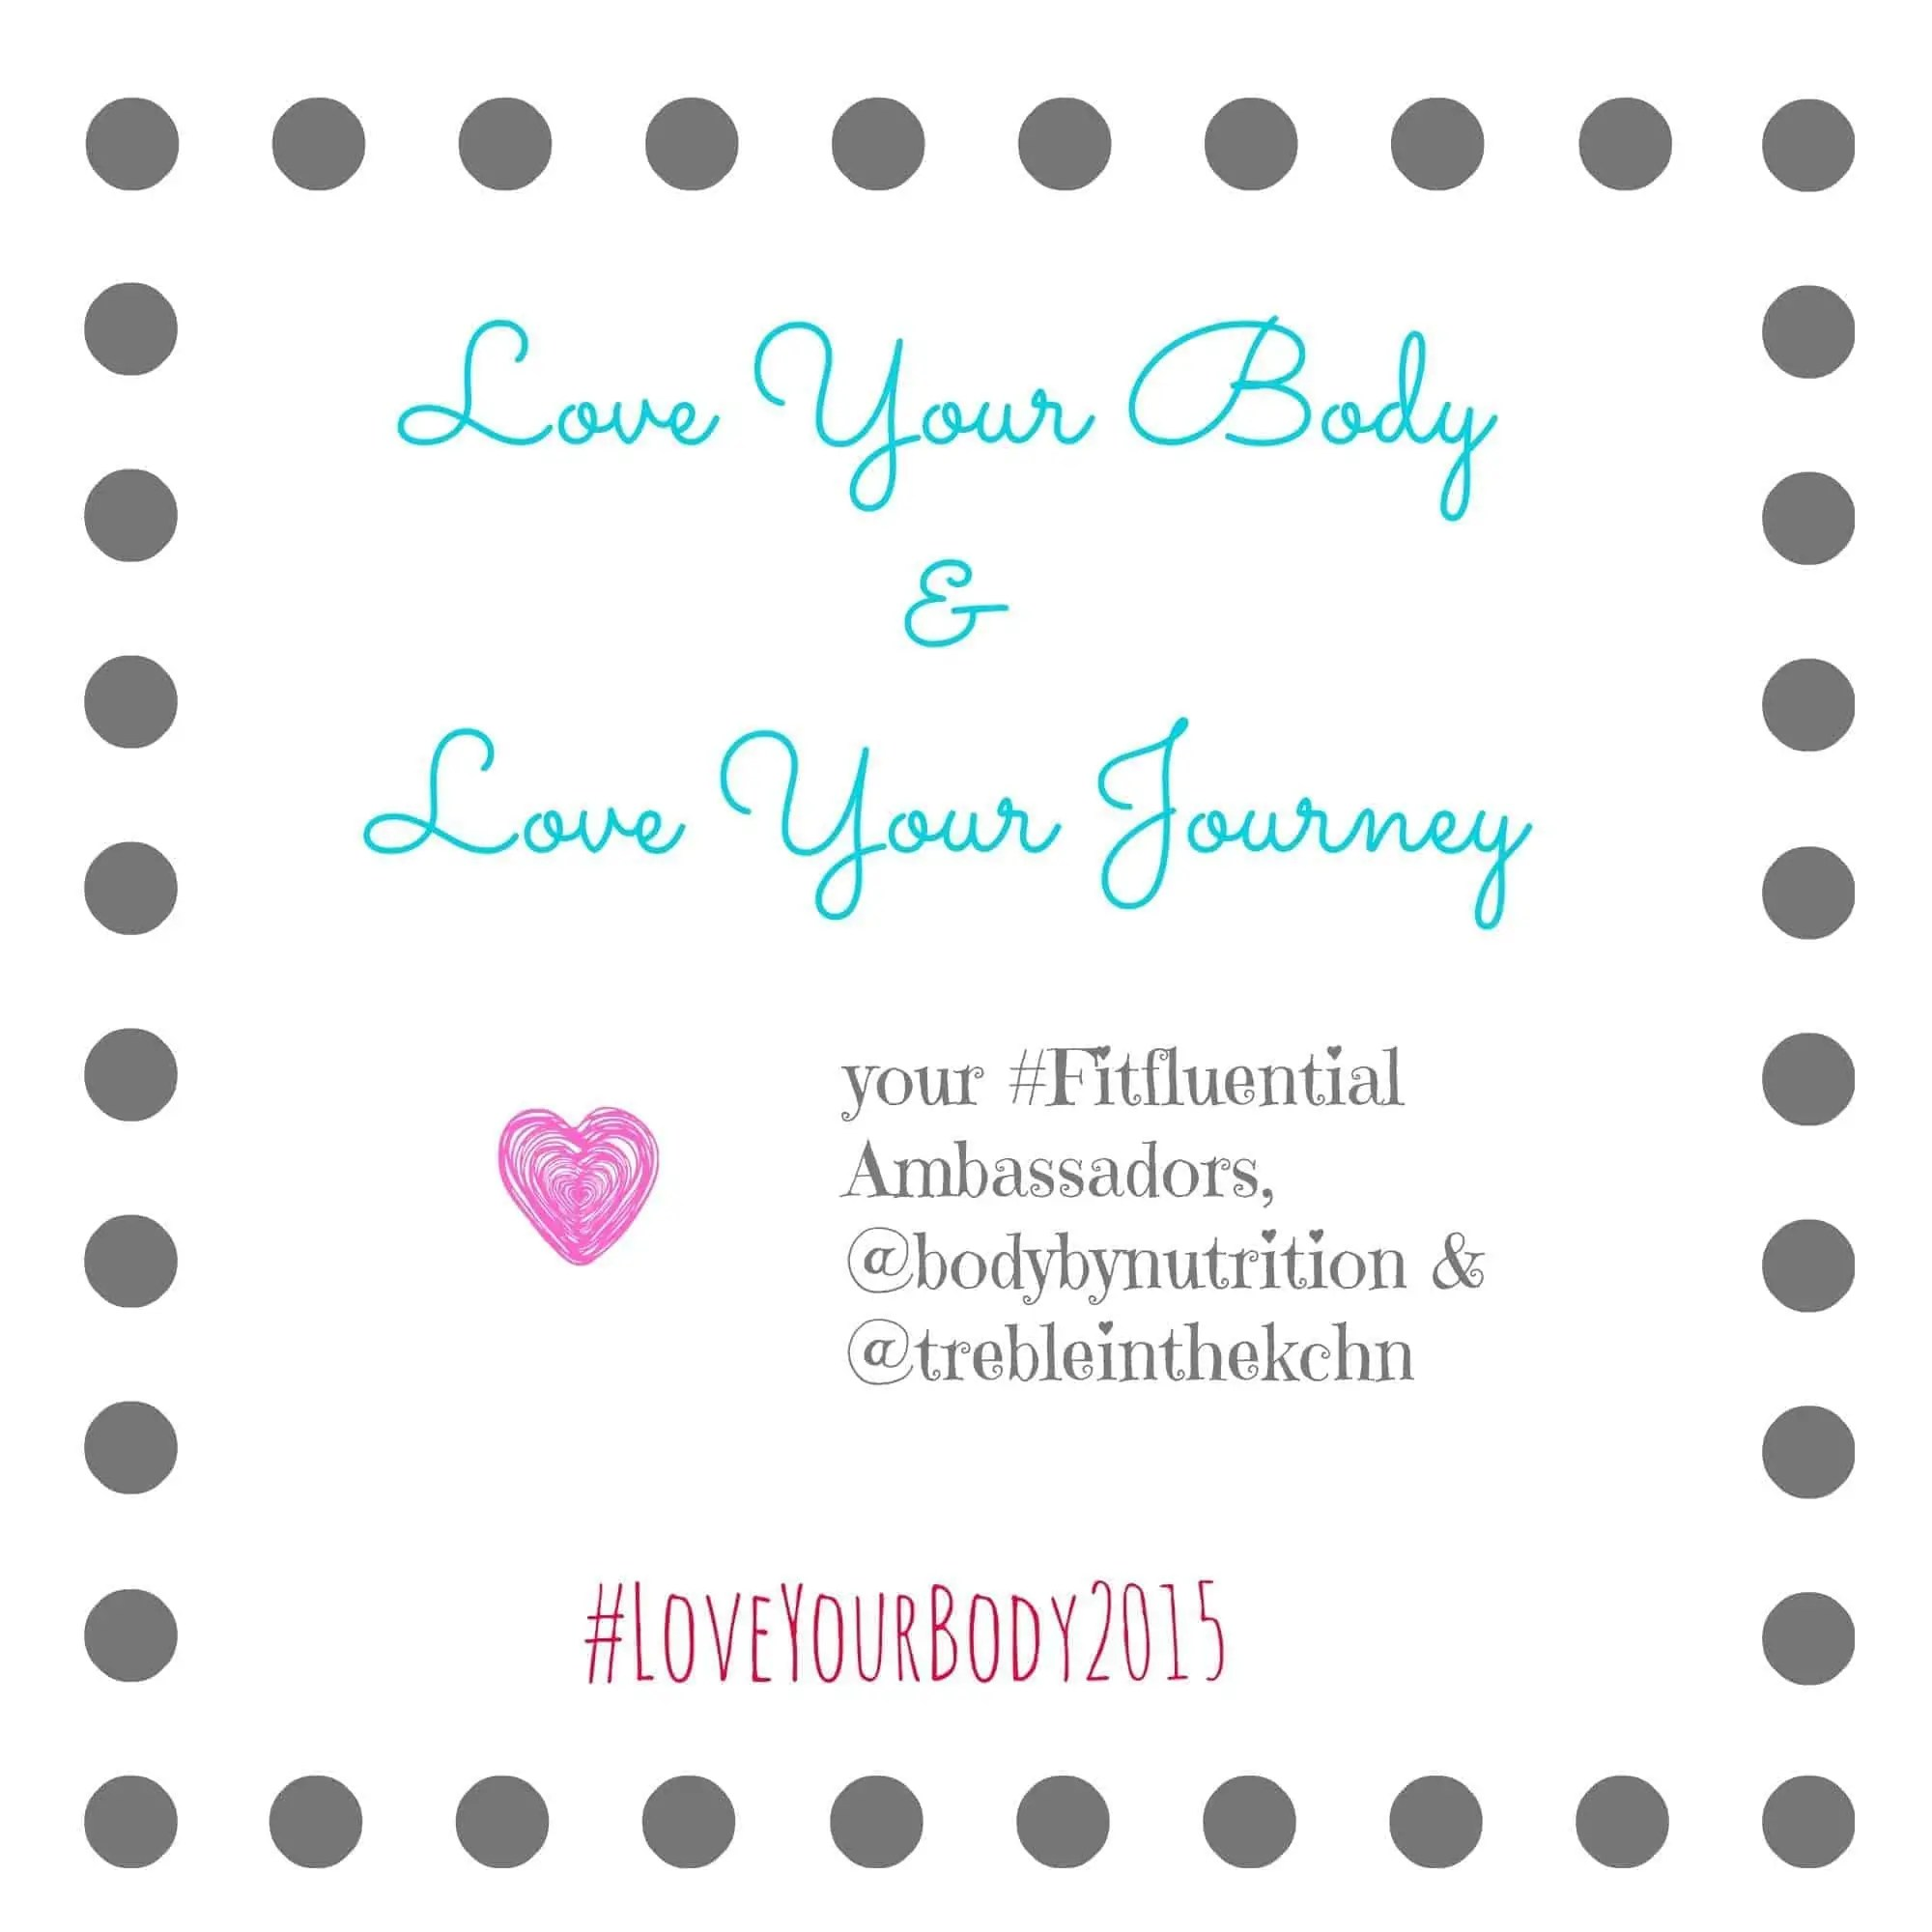 Love Your Body Challenge 2015